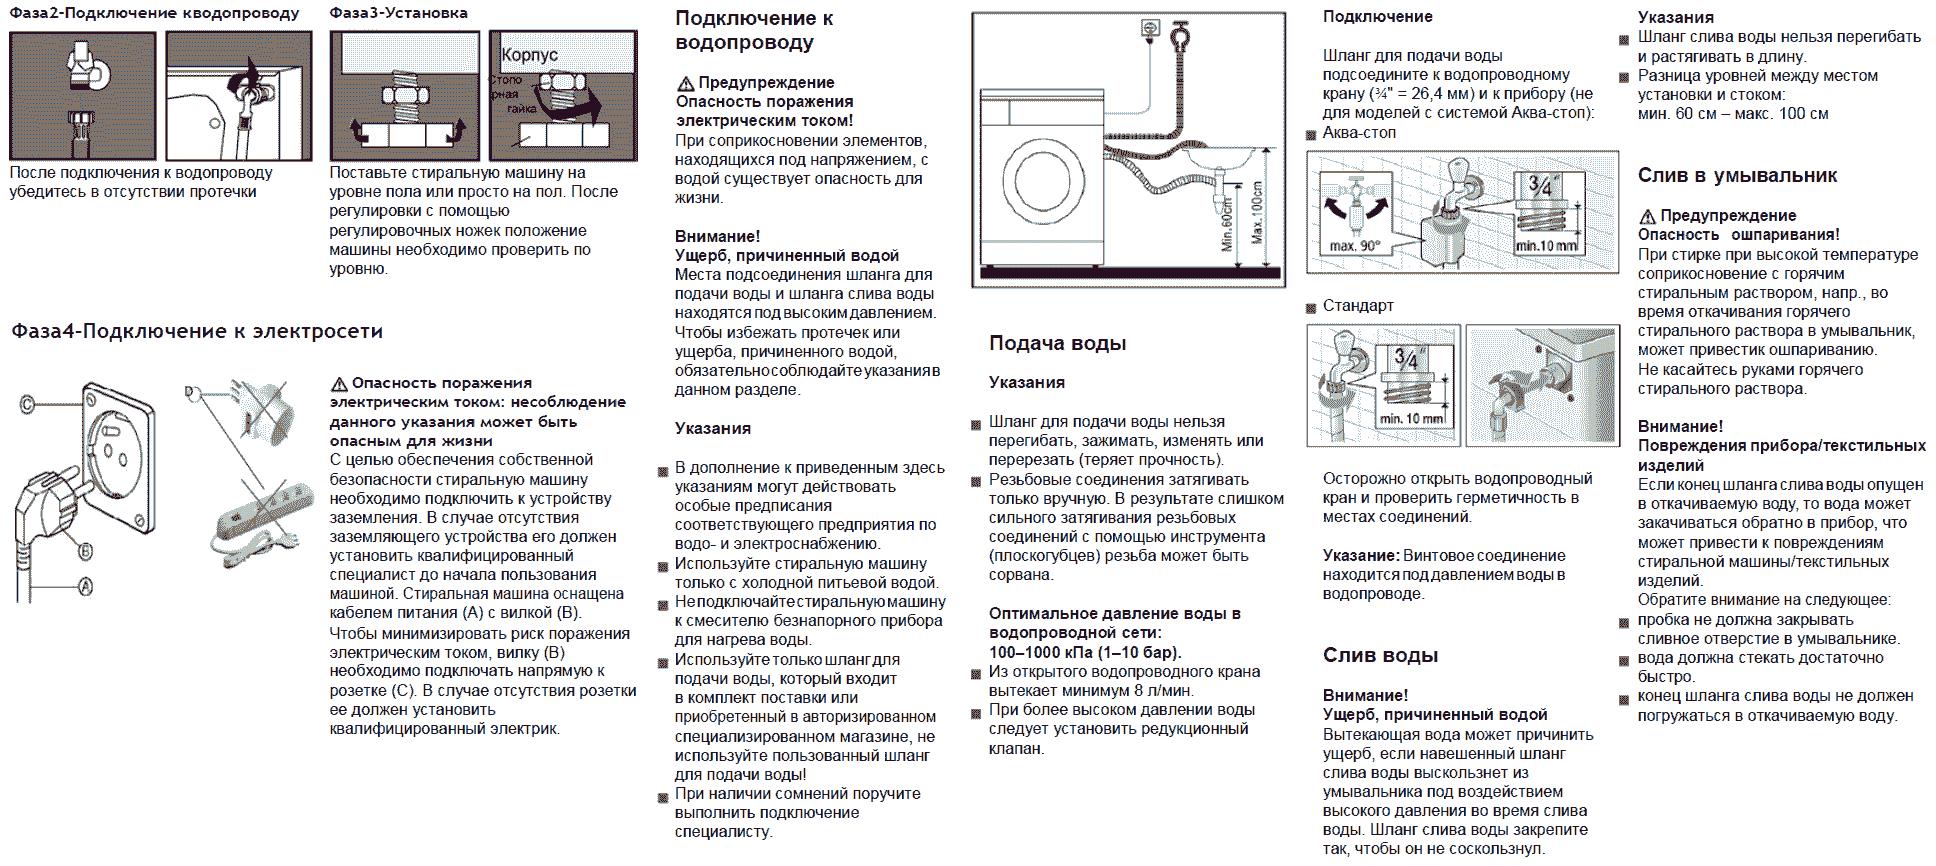 стиральная машина ghibli схема